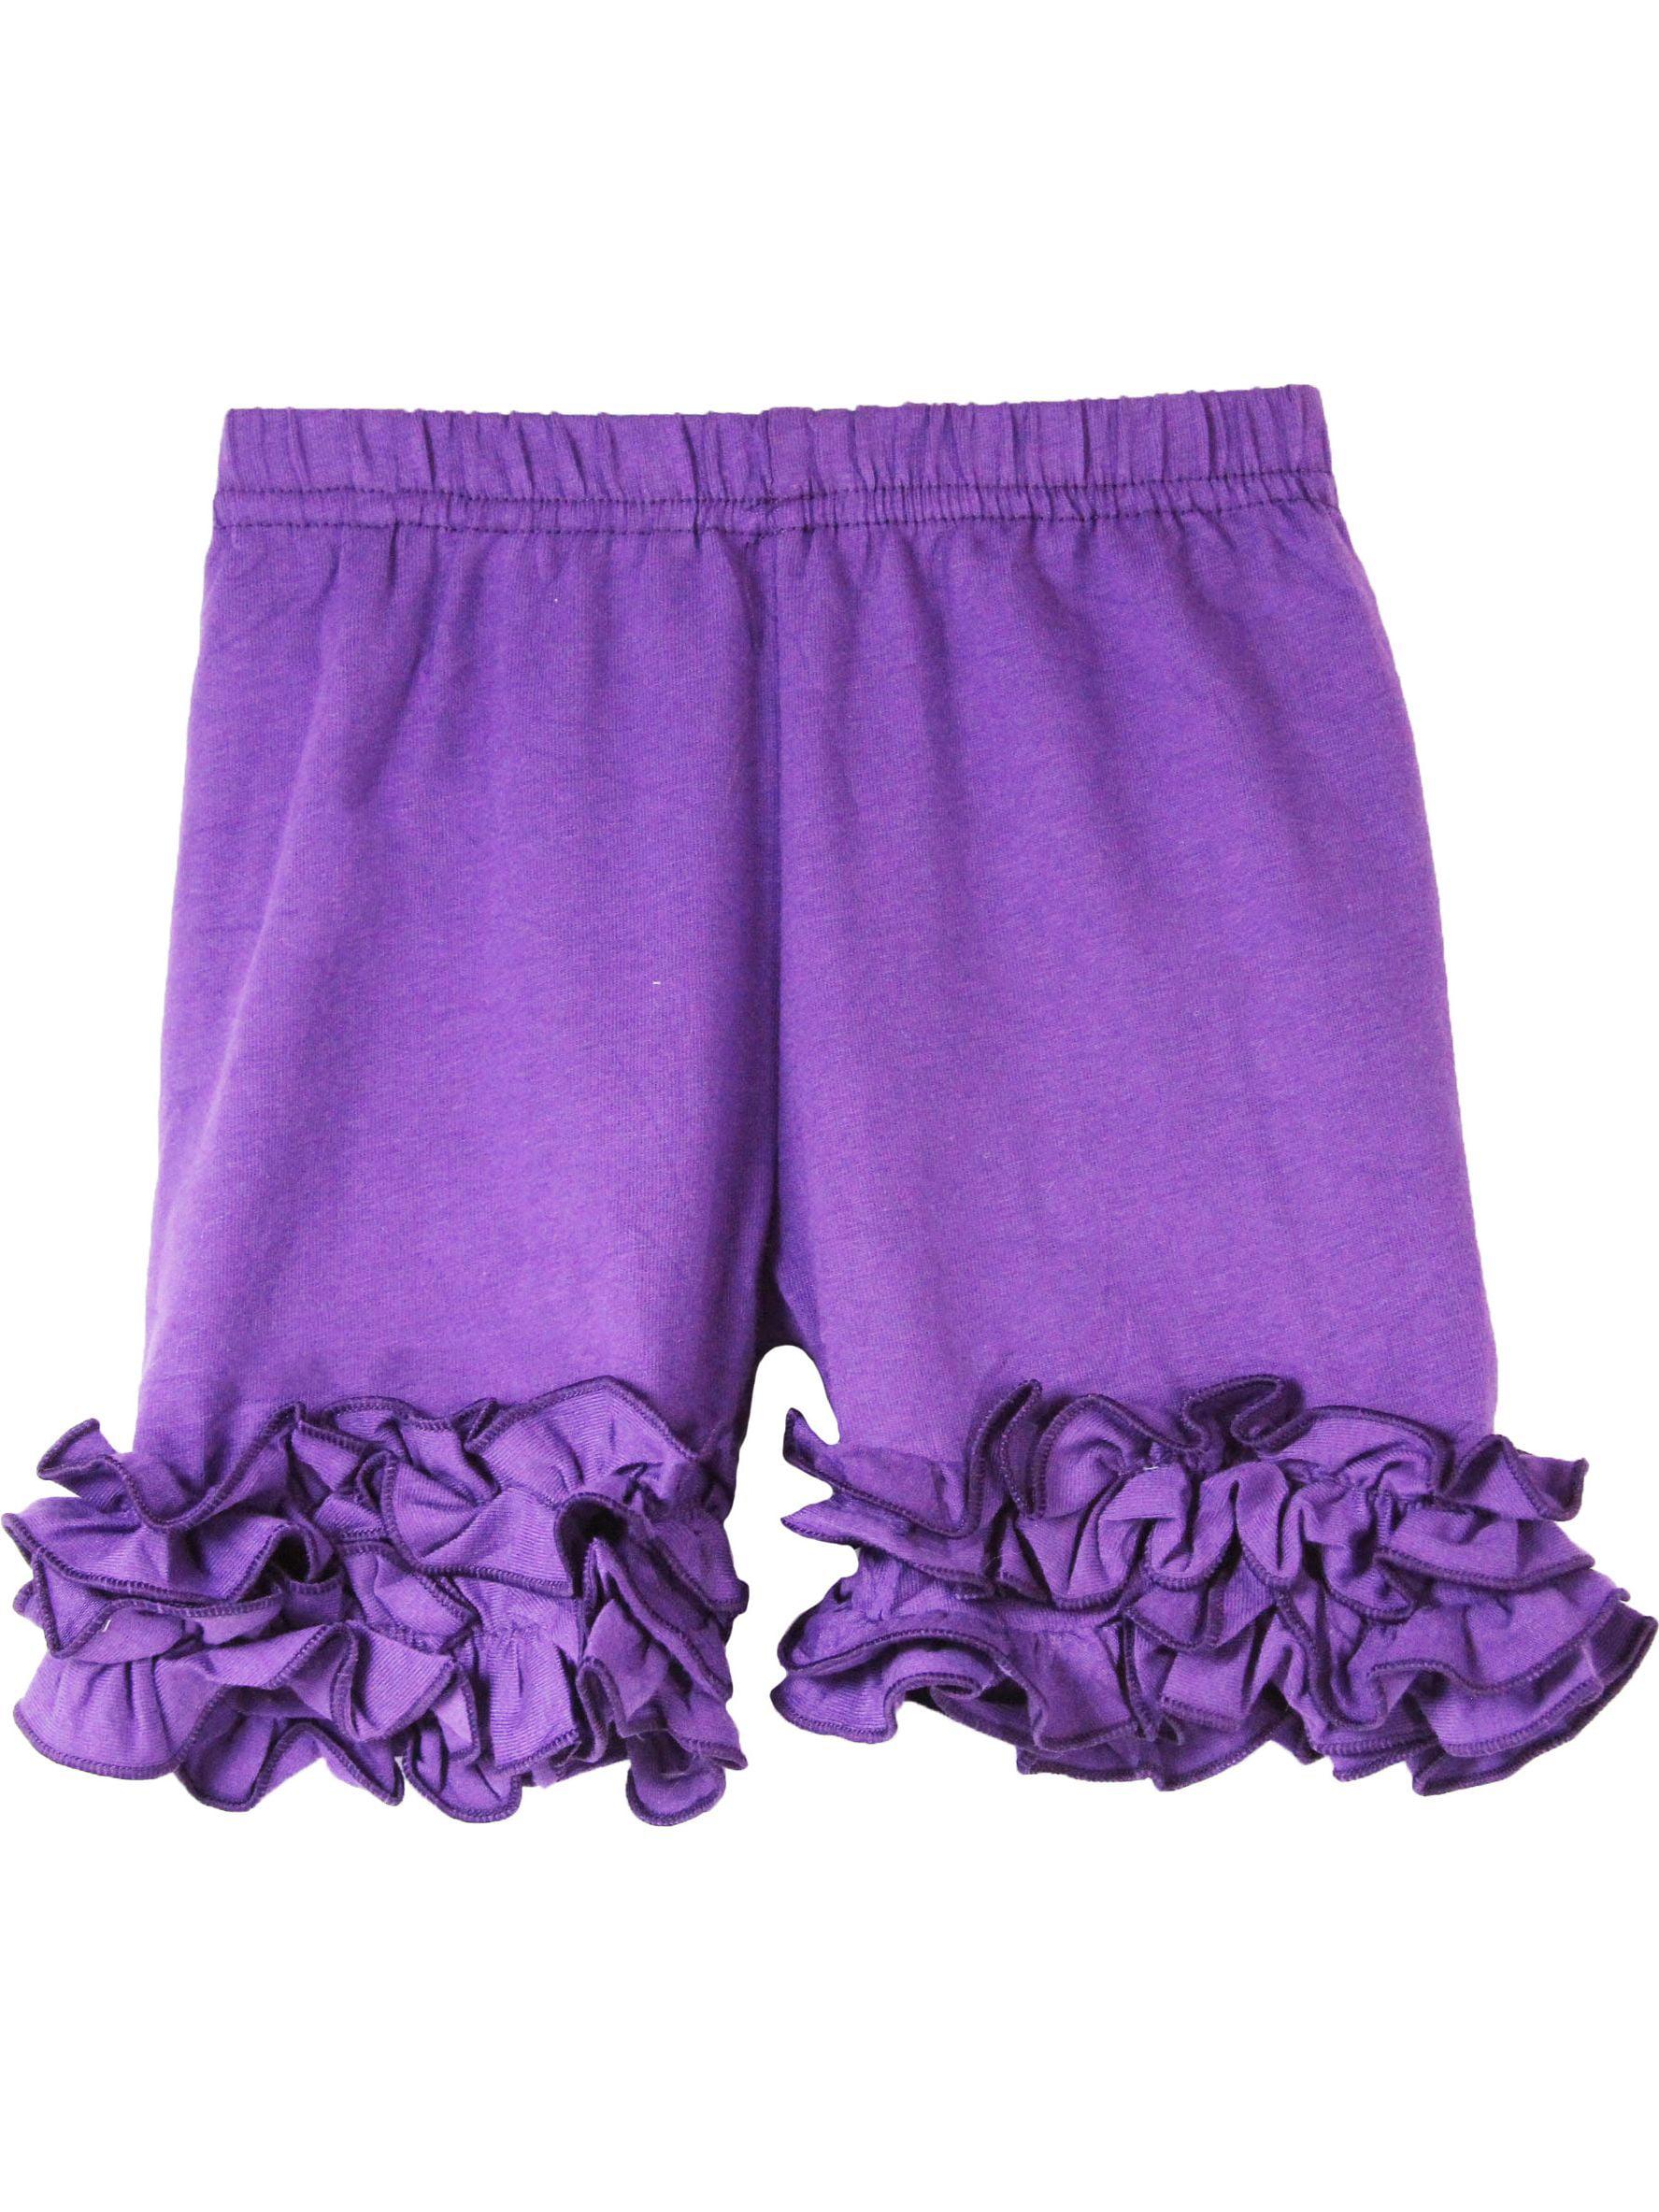 Girls Purple Elastic Waist Ruffle Bottom Icing Boutique Shorts